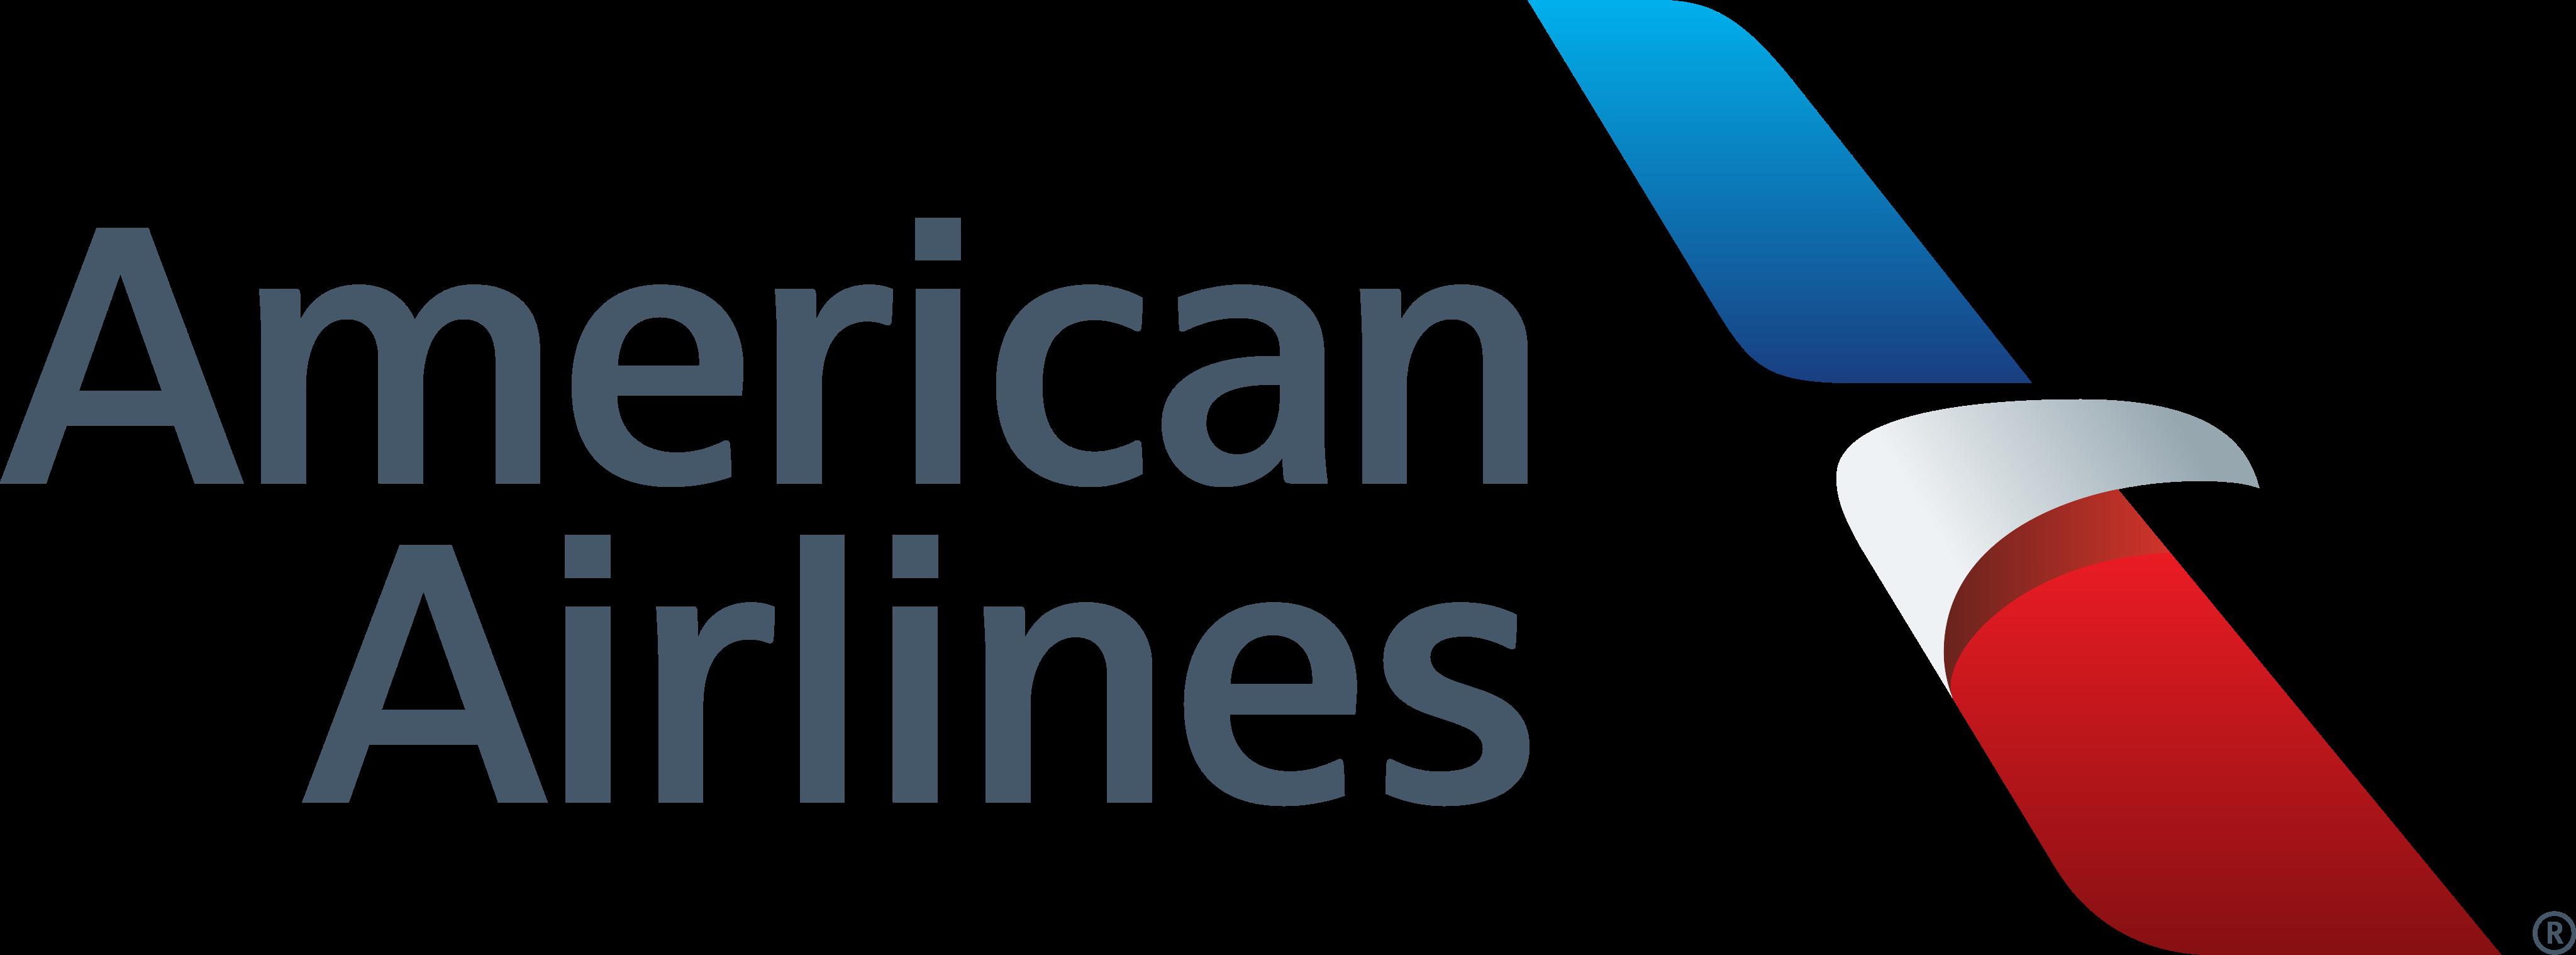 american airlines logo 1 - American Airlines Logo